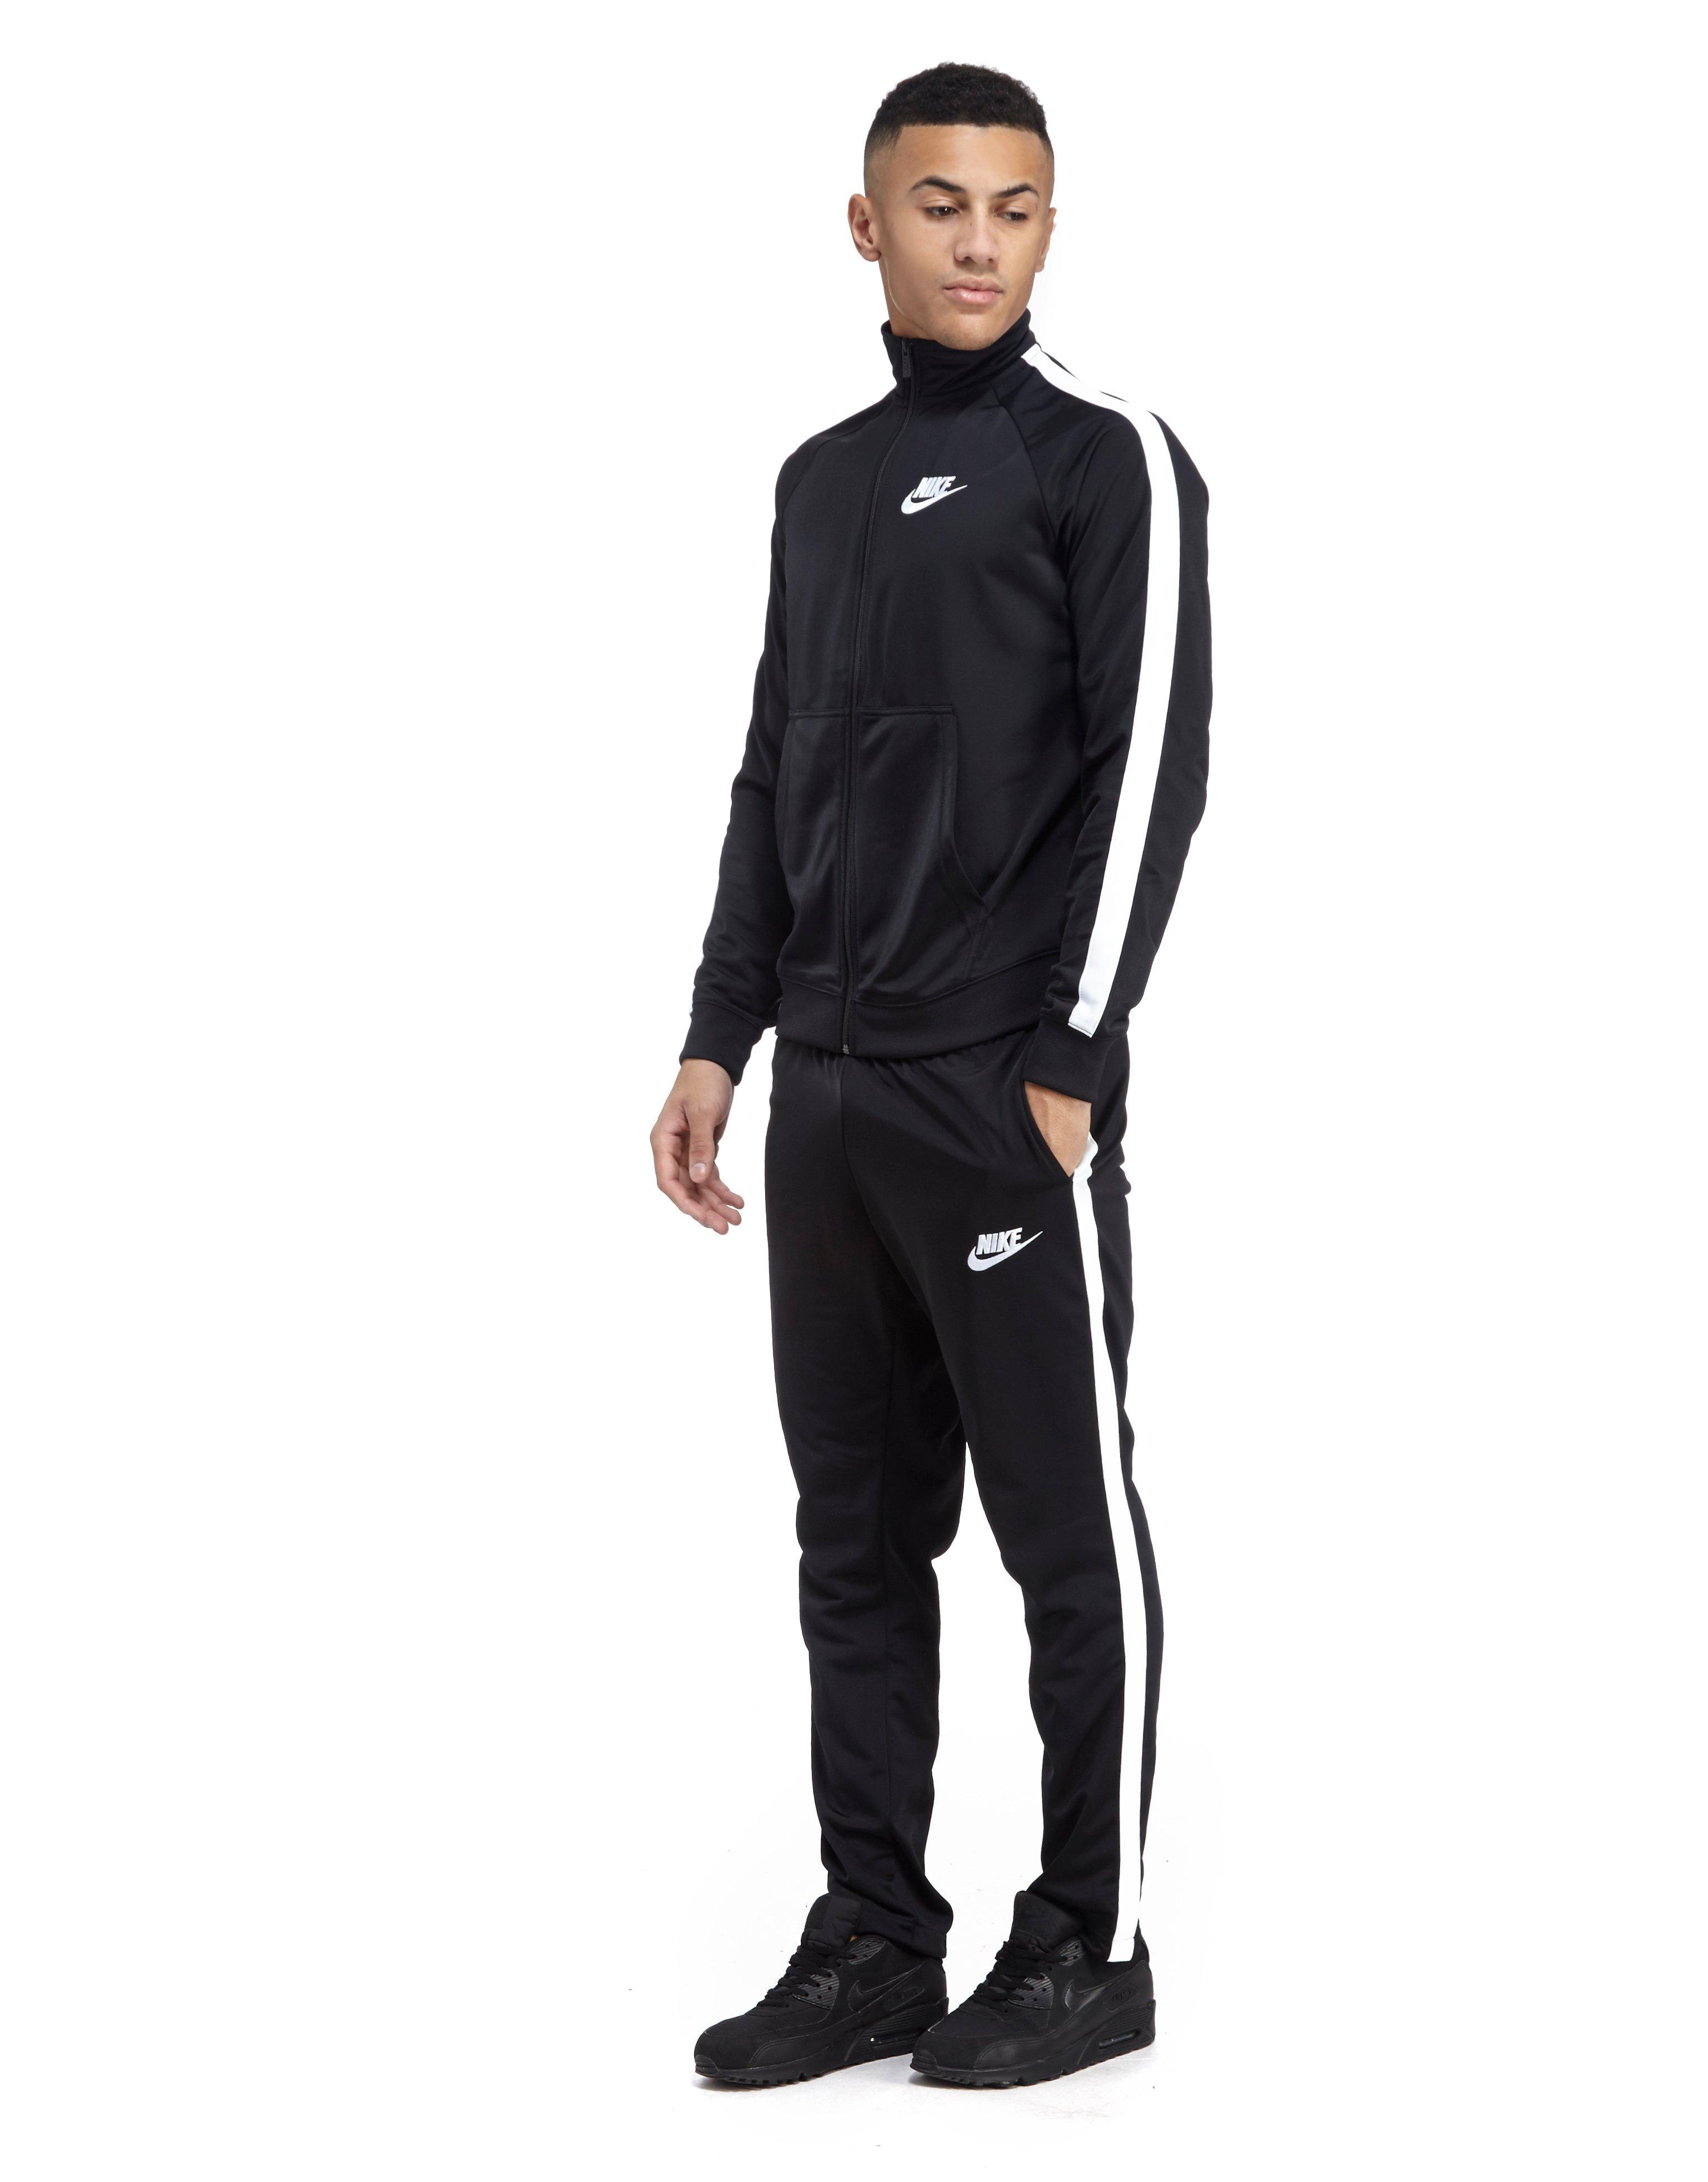 a4995eedf5b3 Nike Season Poly Tracksuit in Black for Men - Lyst